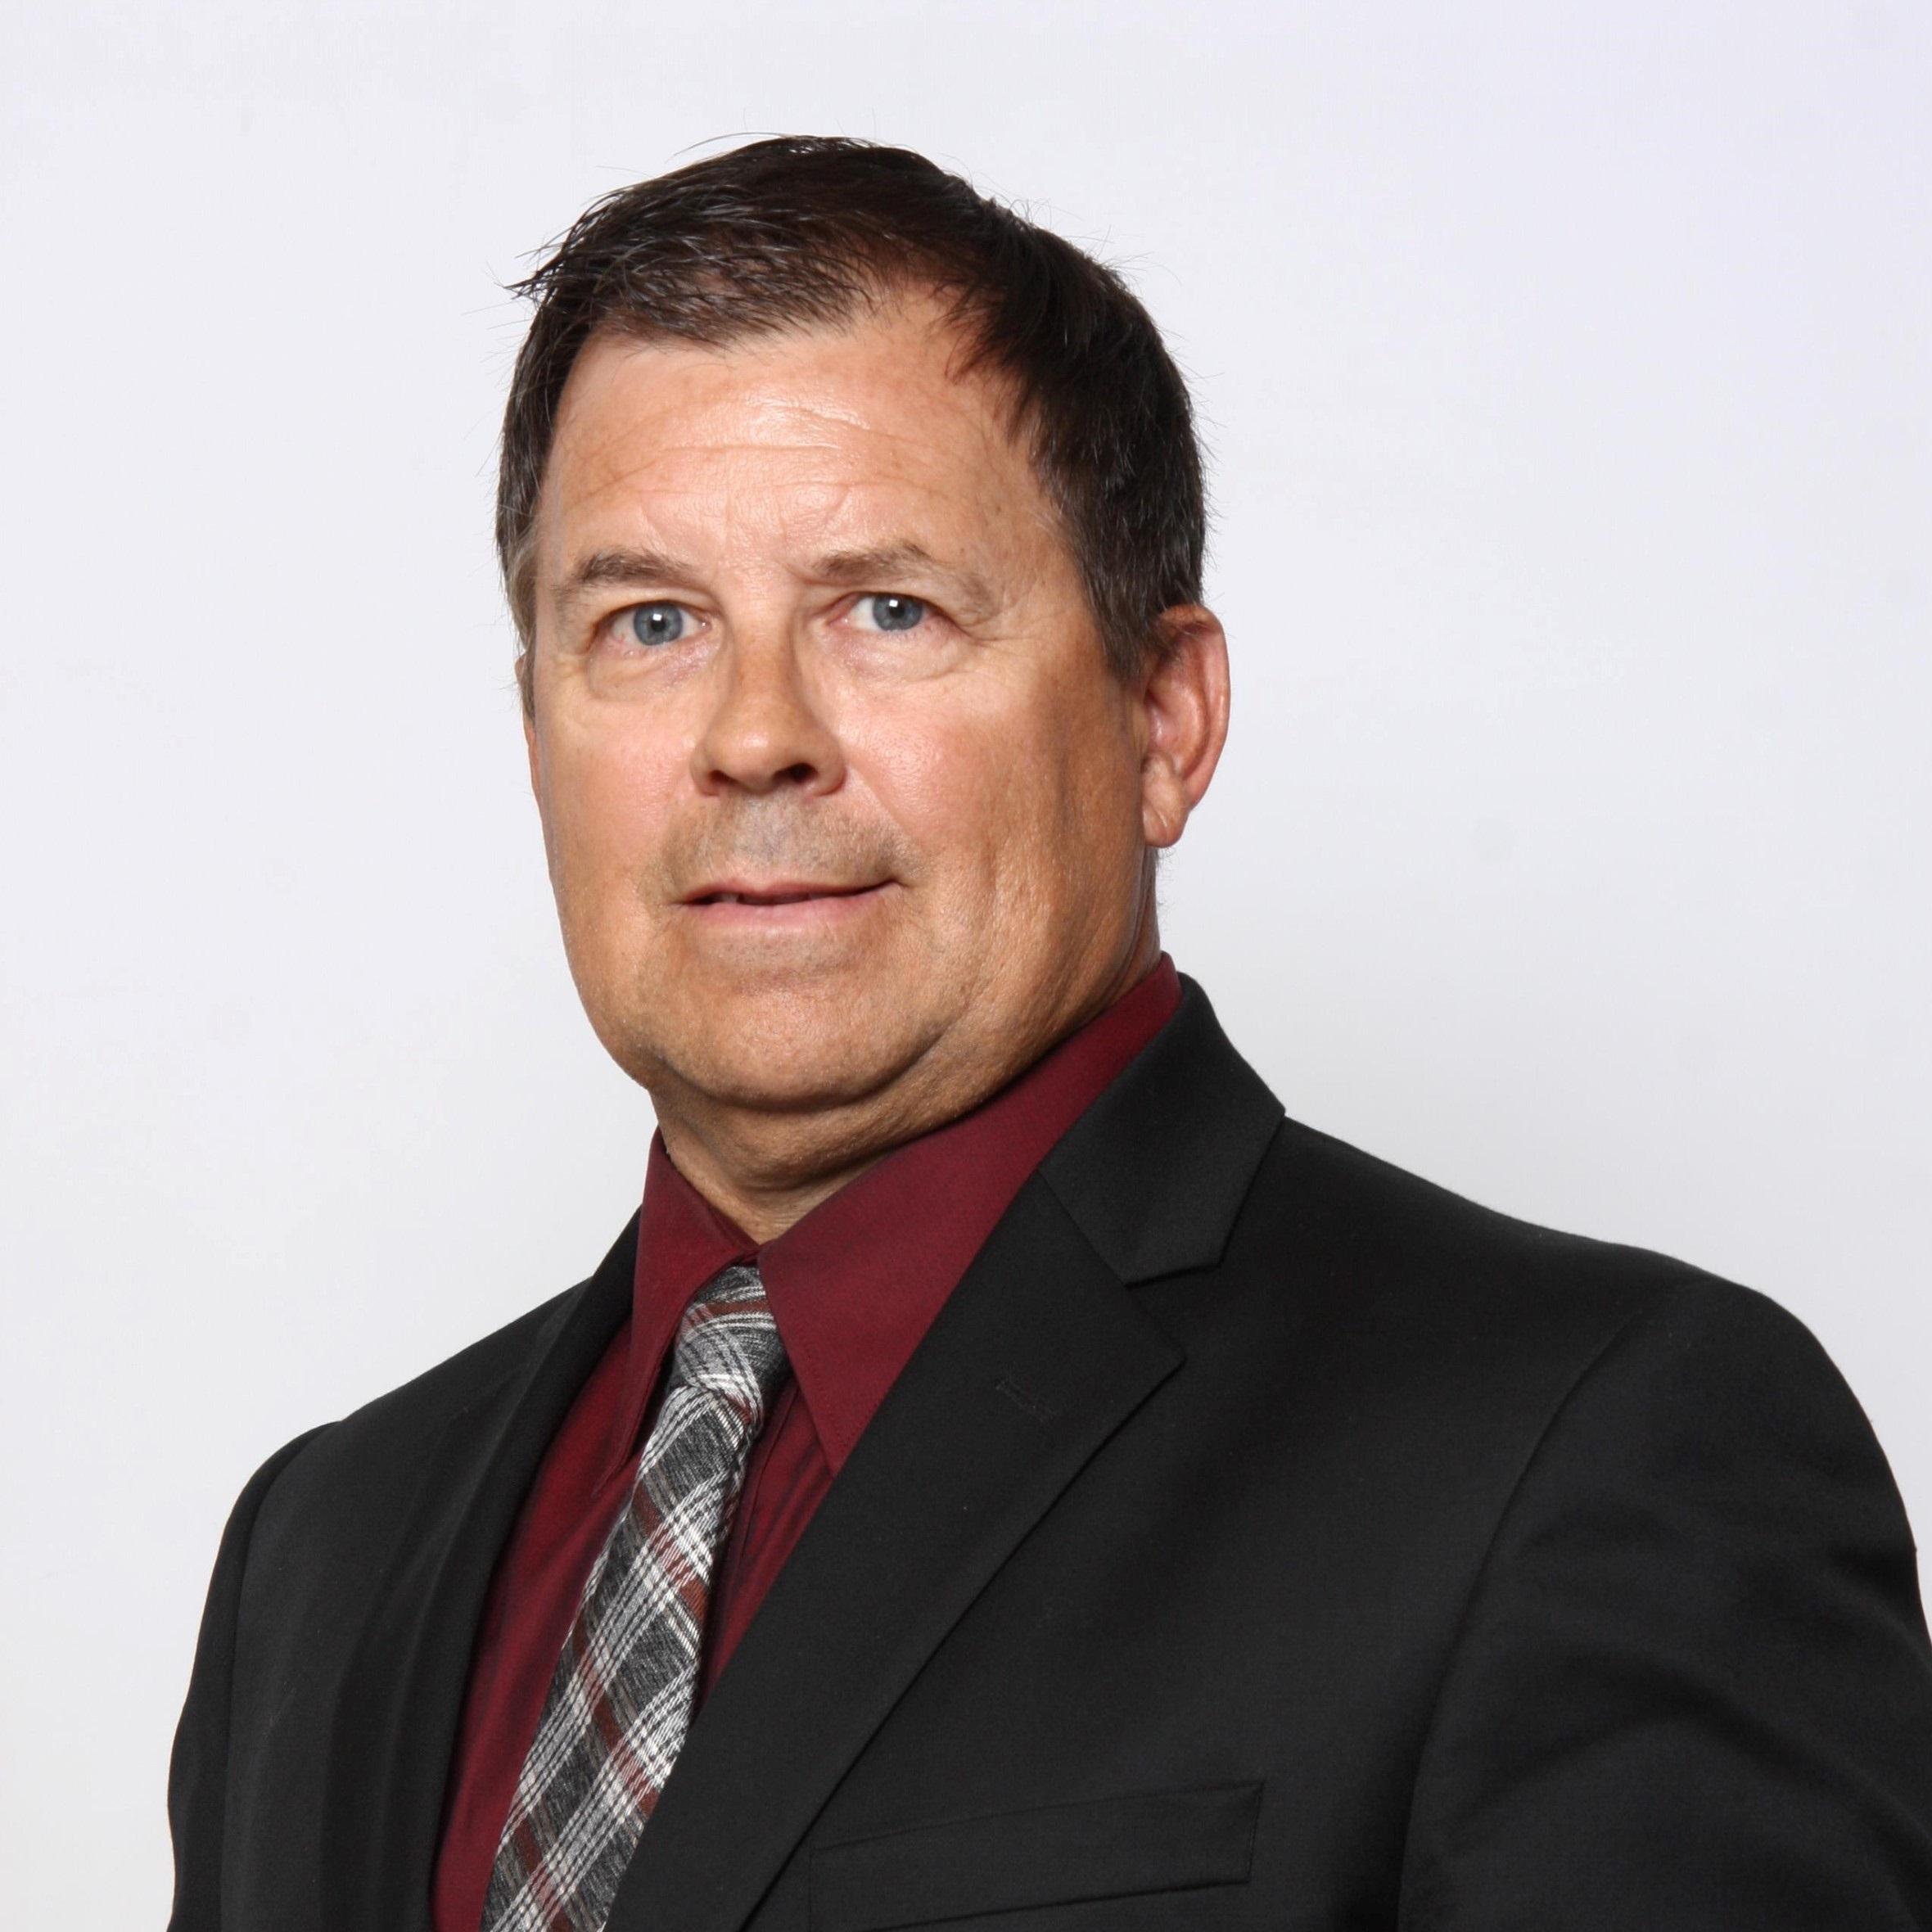 Jeff Golka